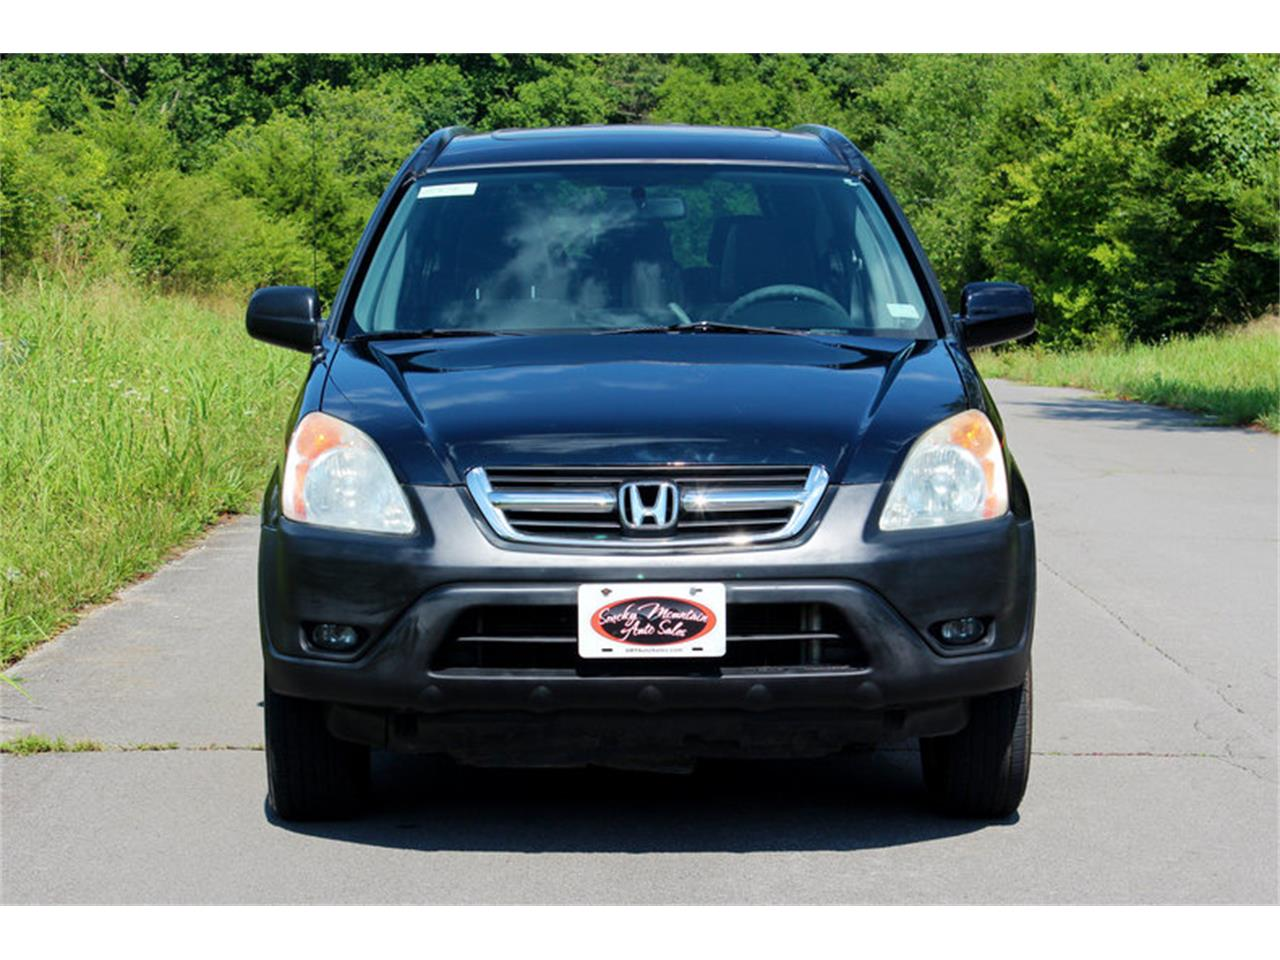 2003 Honda Crv For Sale Cc 1140692 Cr V Large Picture Of 03 499500 Og5w